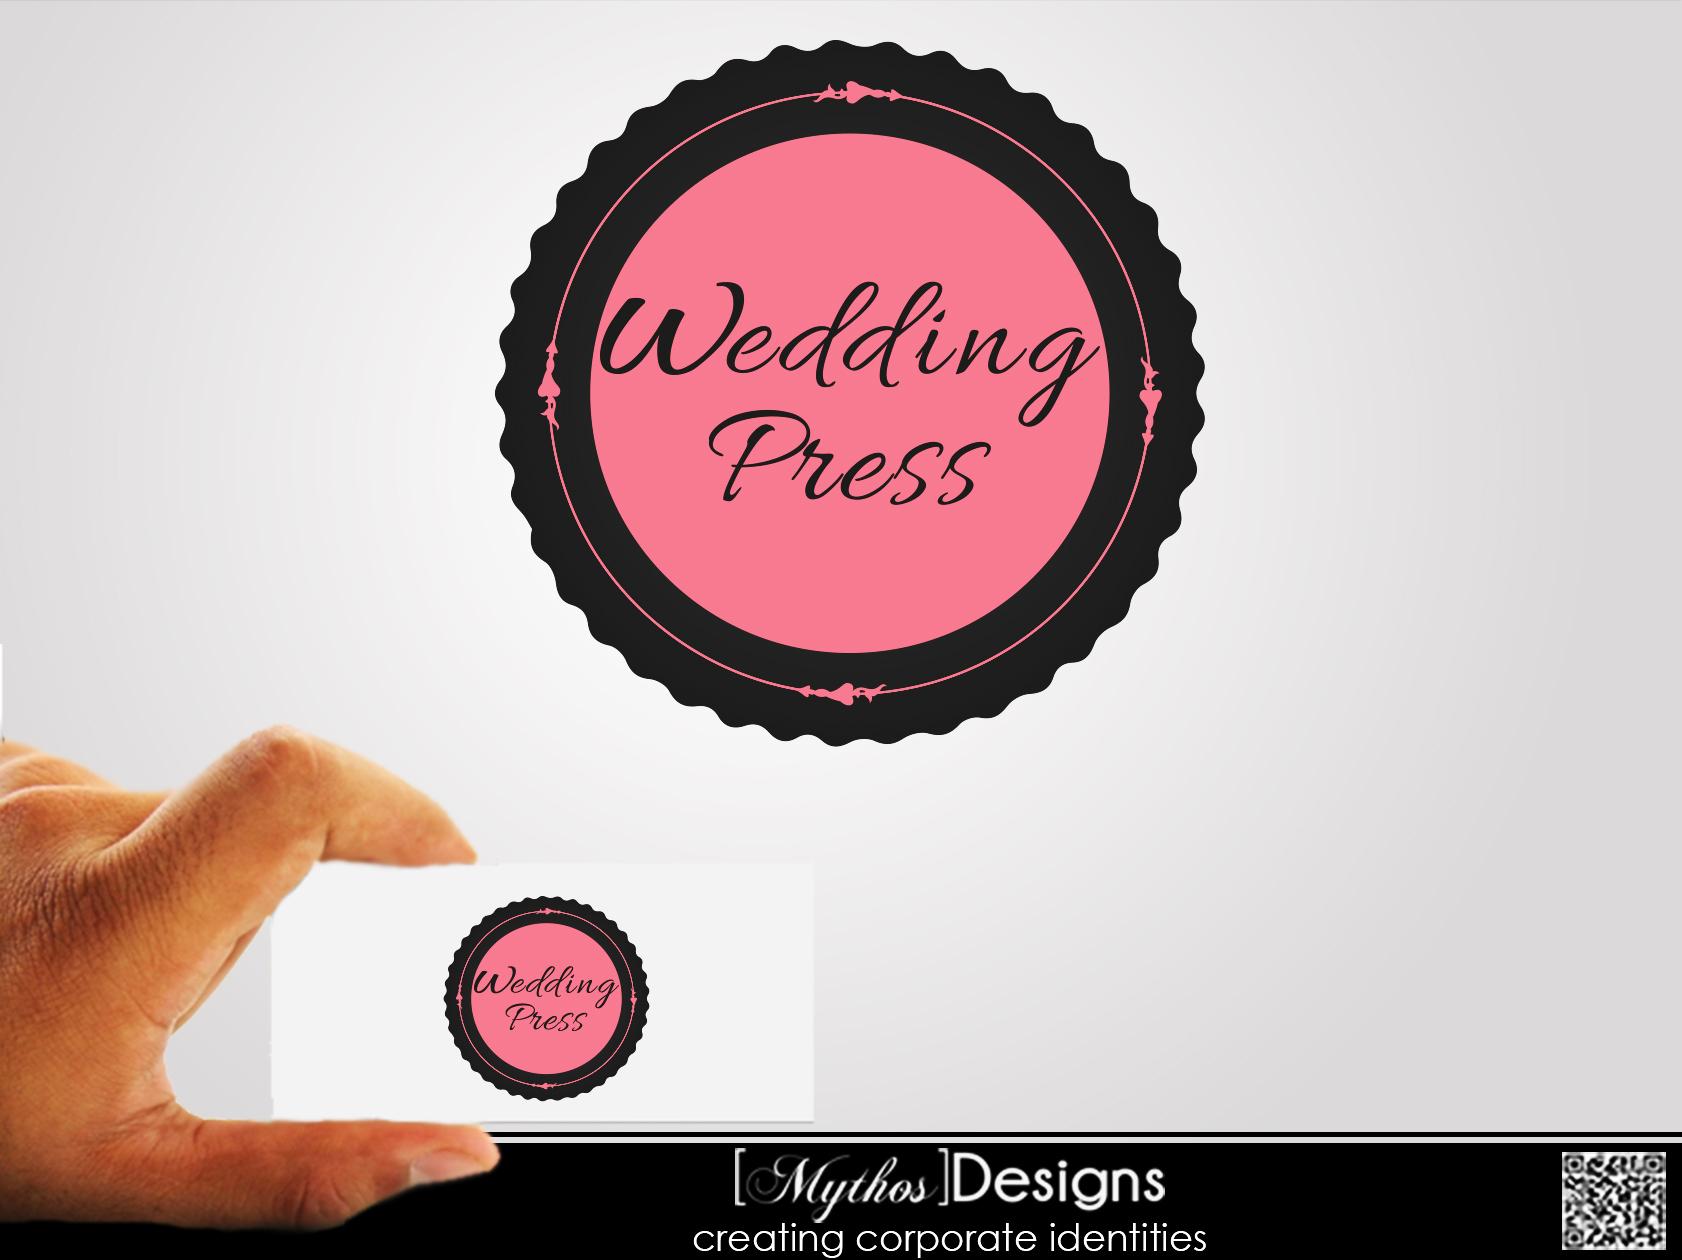 Logo Design by Mythos Designs - Entry No. 8 in the Logo Design Contest Wedding Writes Logo Design.